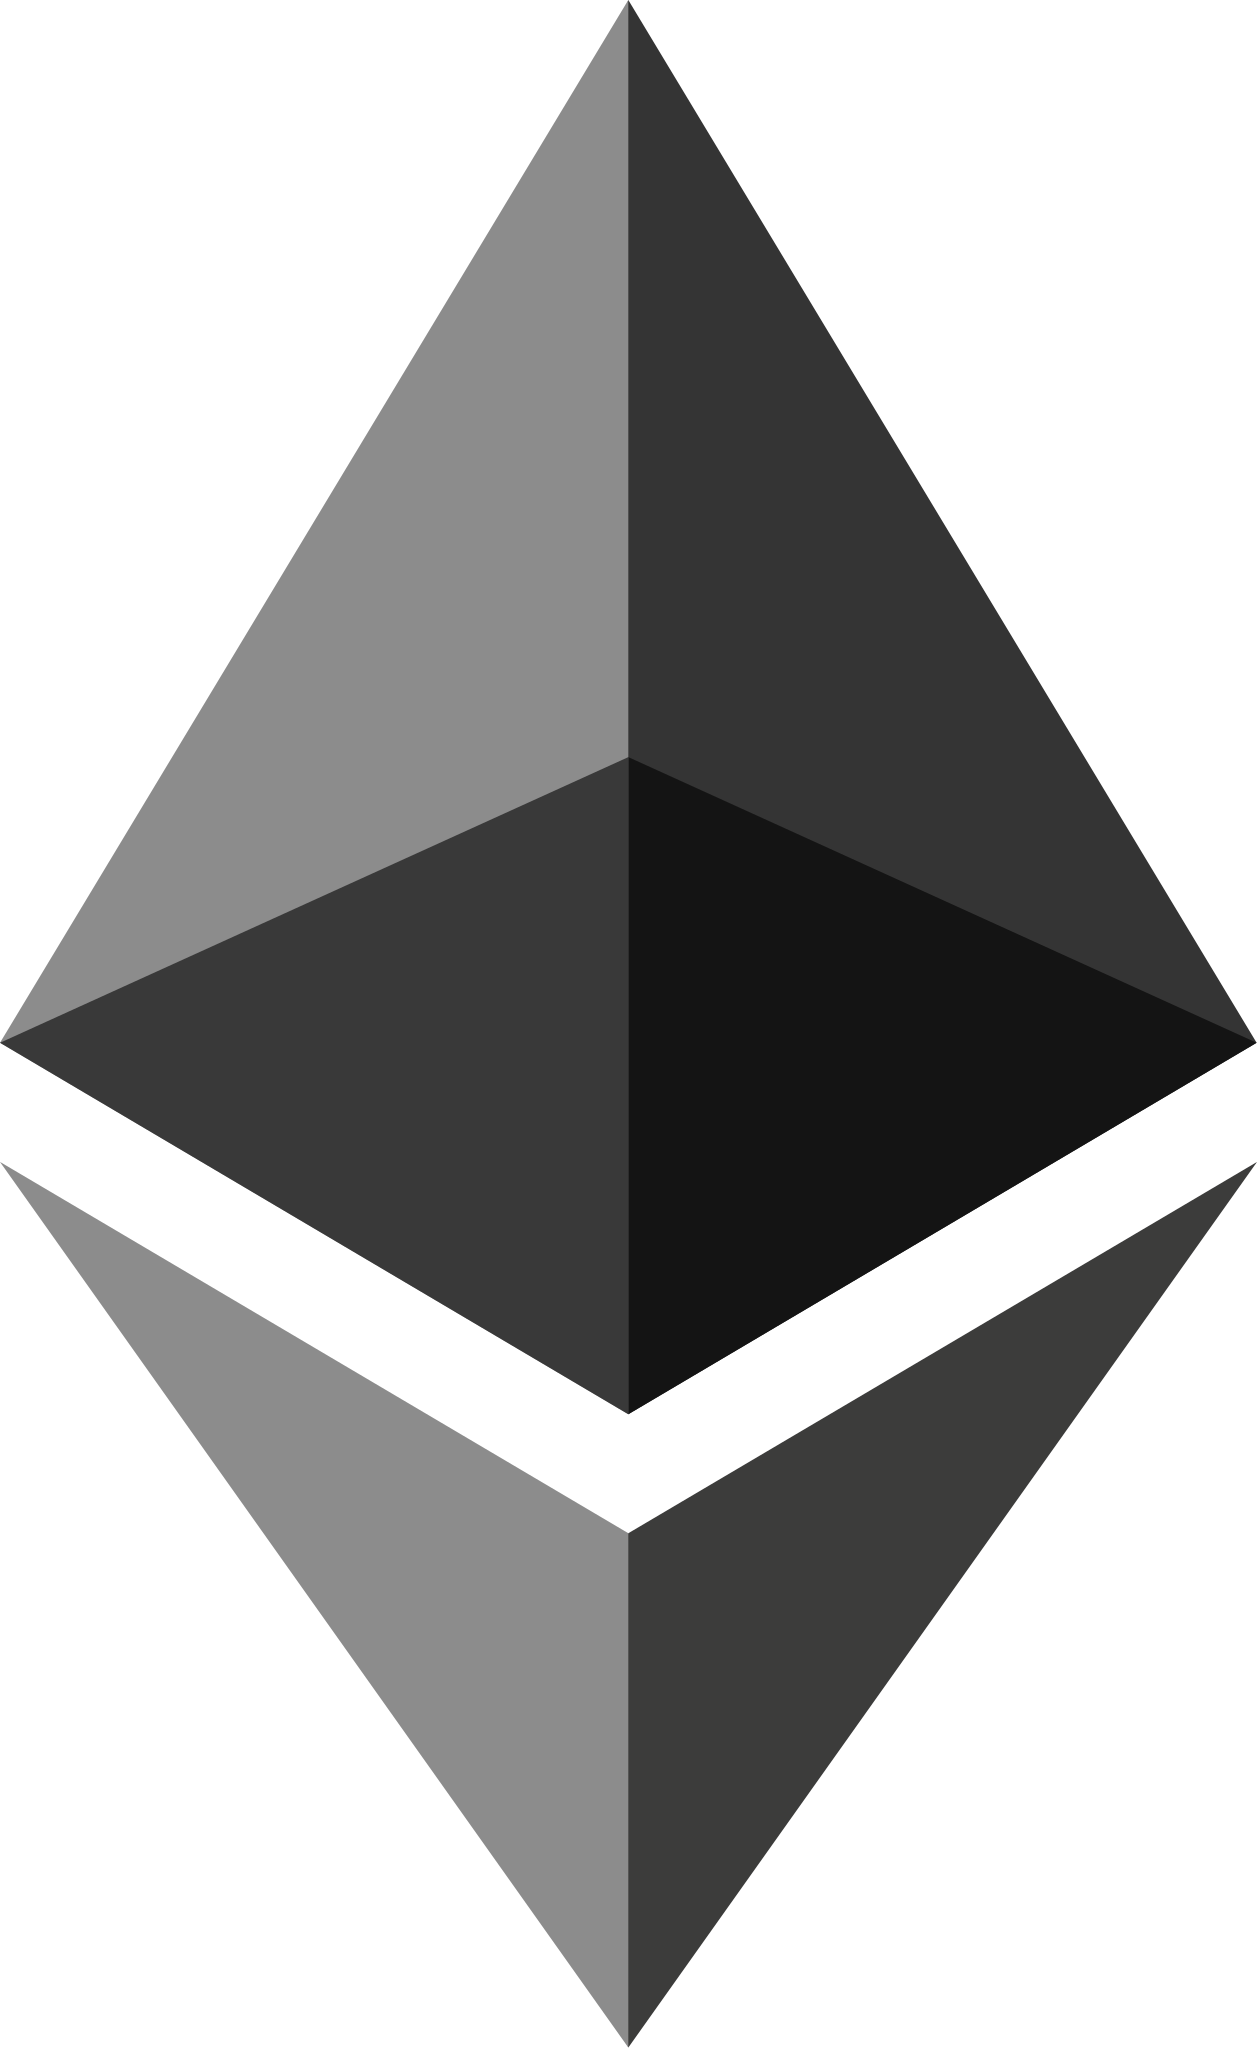 File:Ethereum logo 2014.svg - Wikimedia Commons